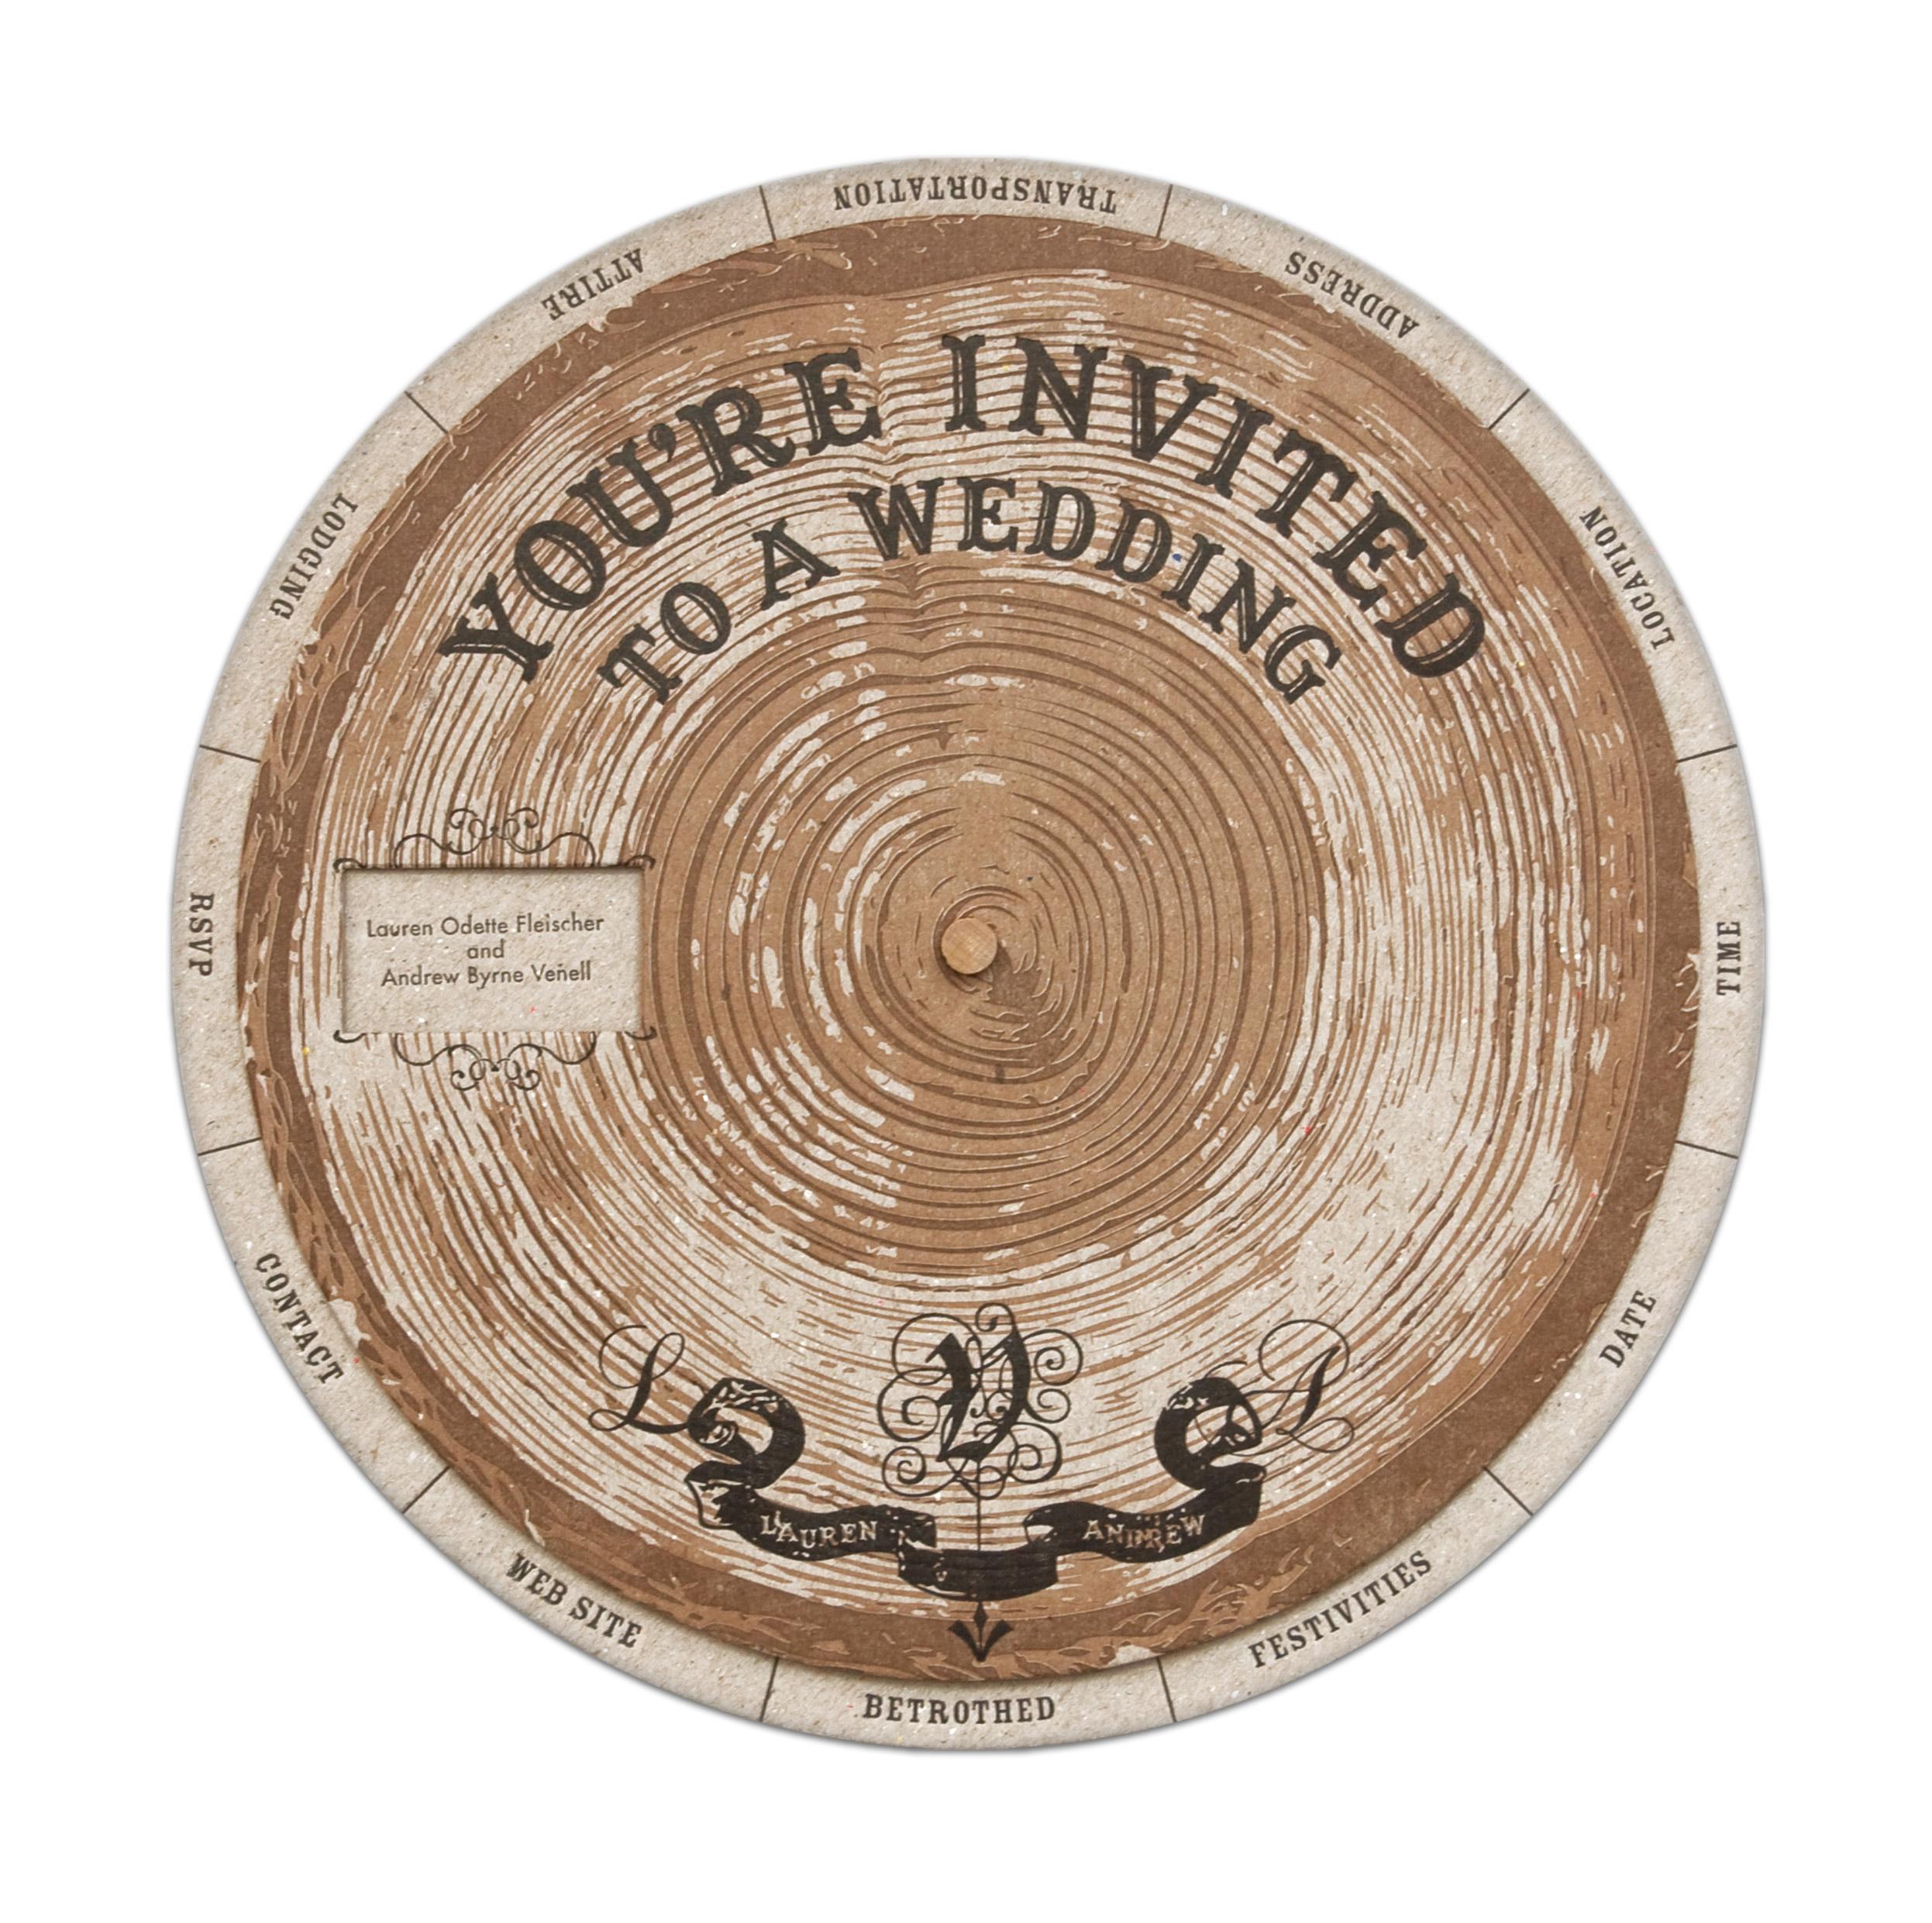 wedding-invitation-wheel-venell.jpg